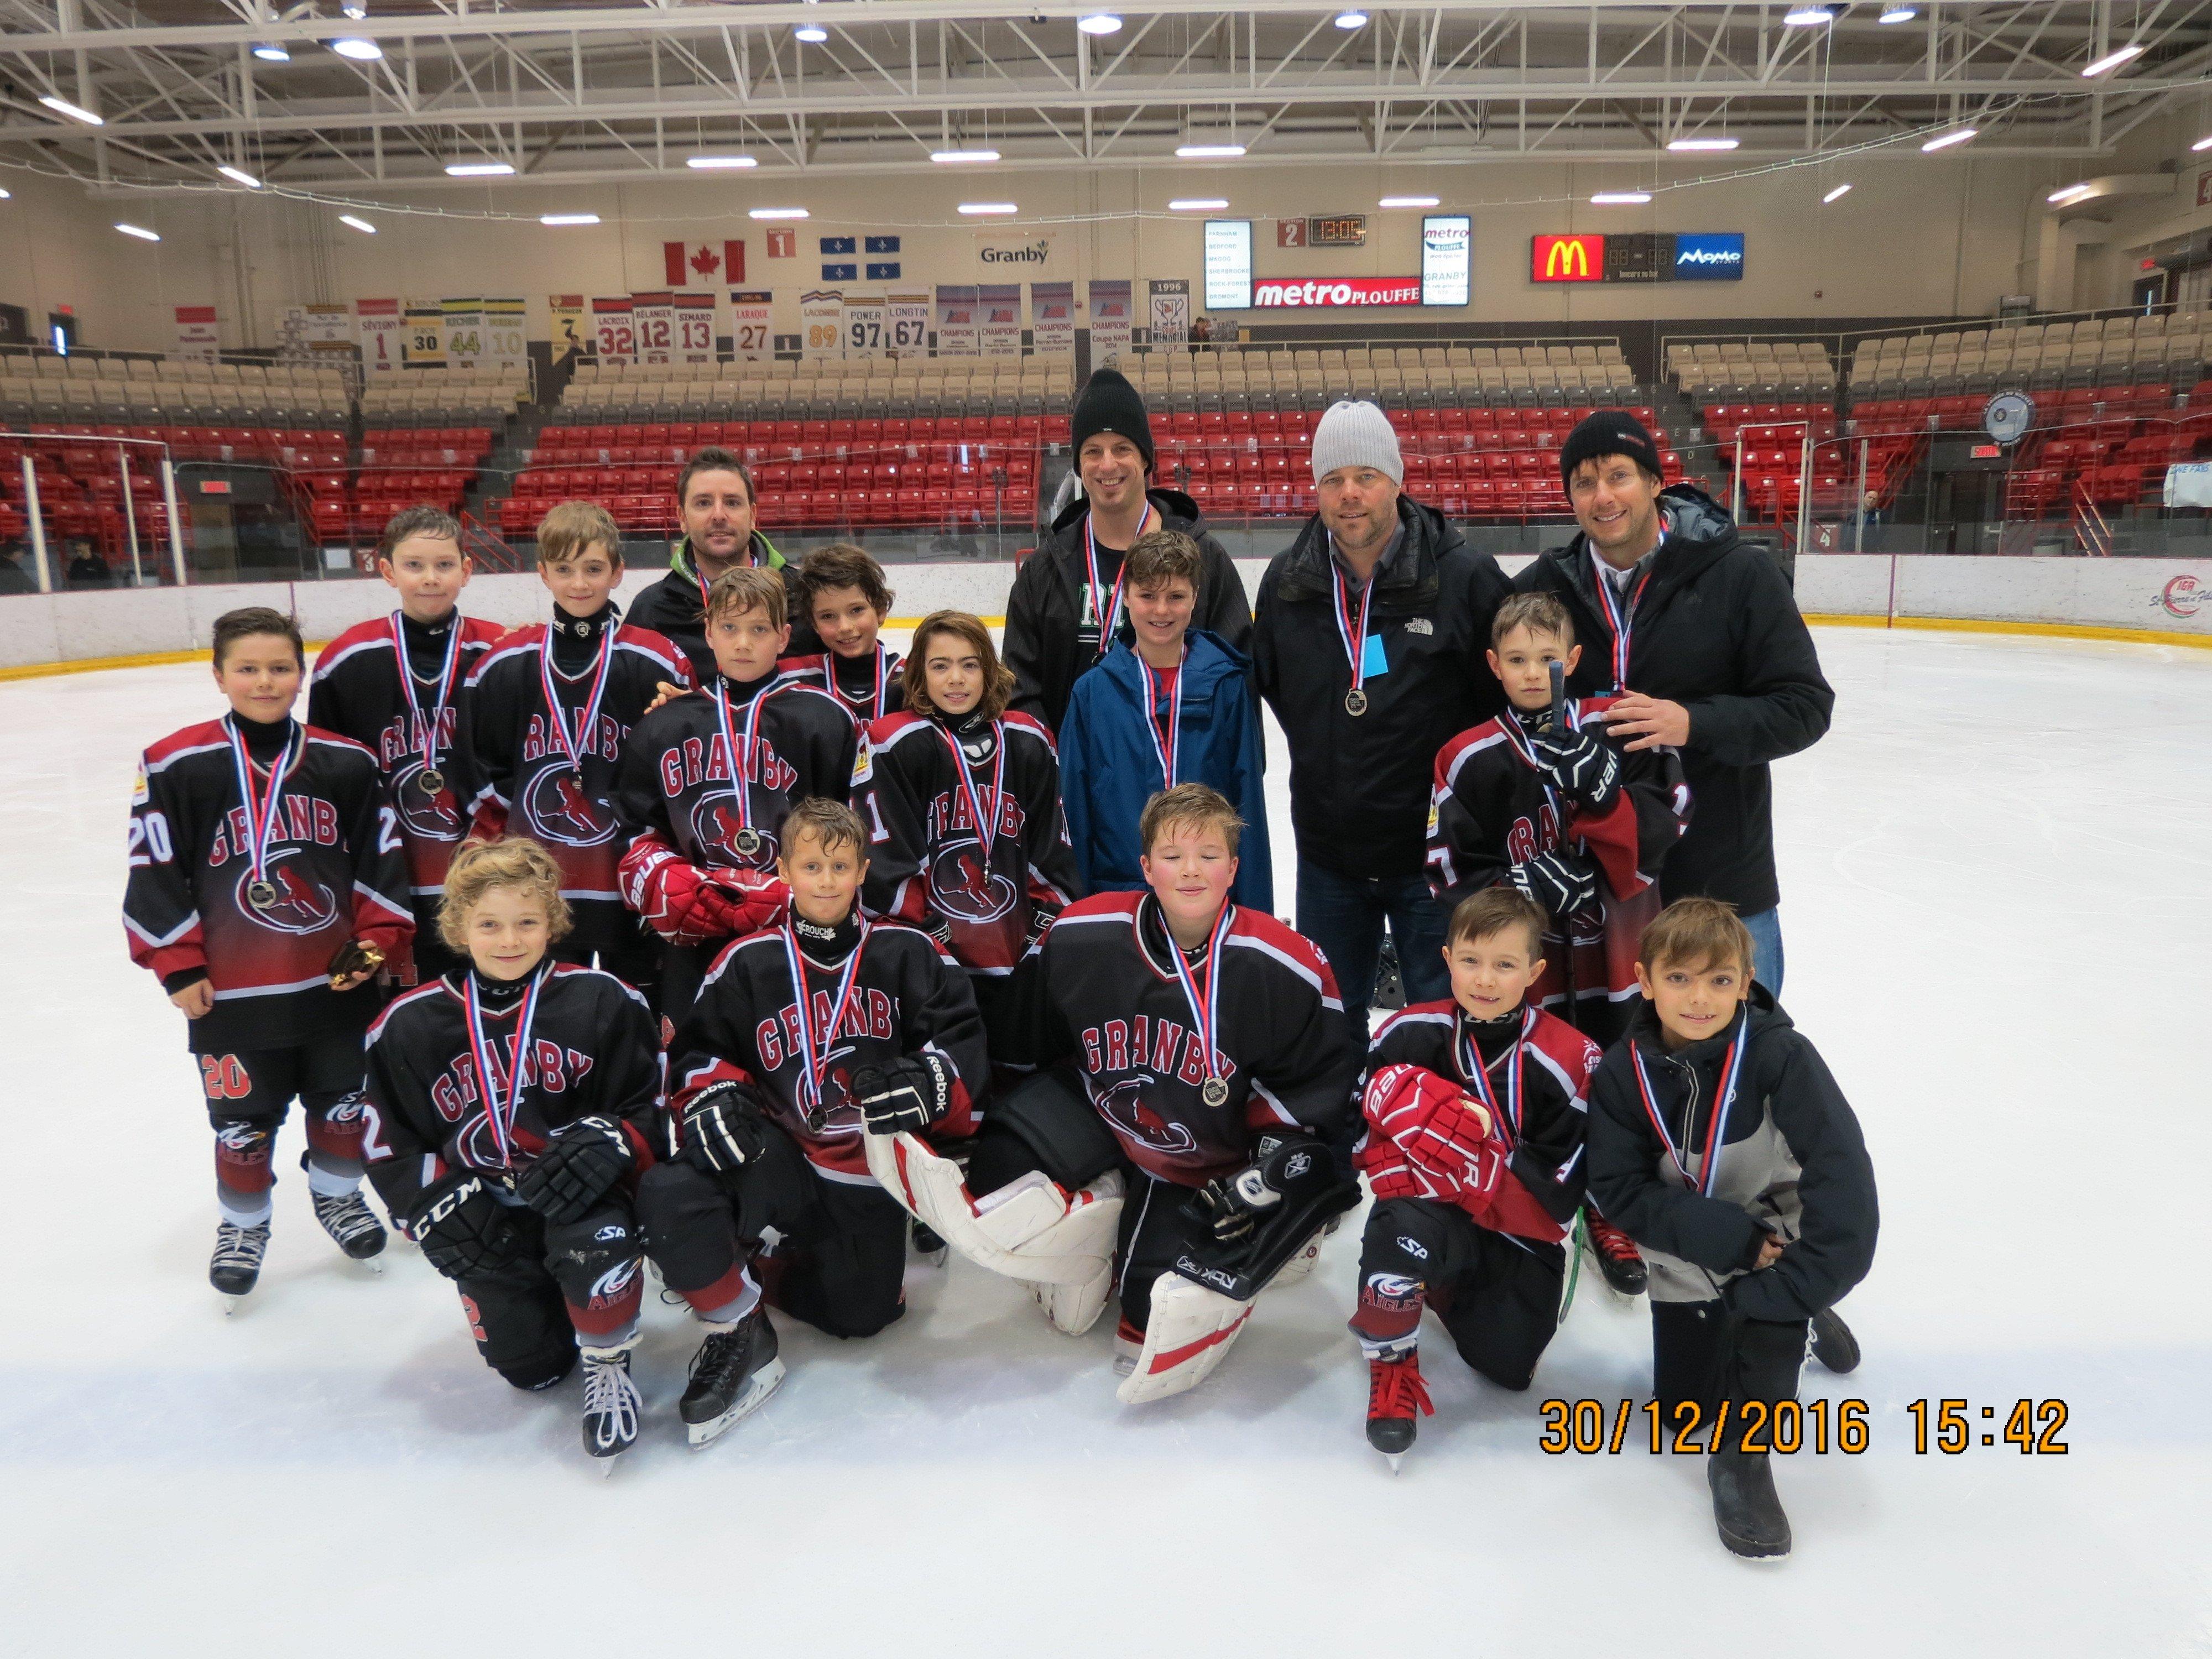 Rencontre hockey atome granby 2016